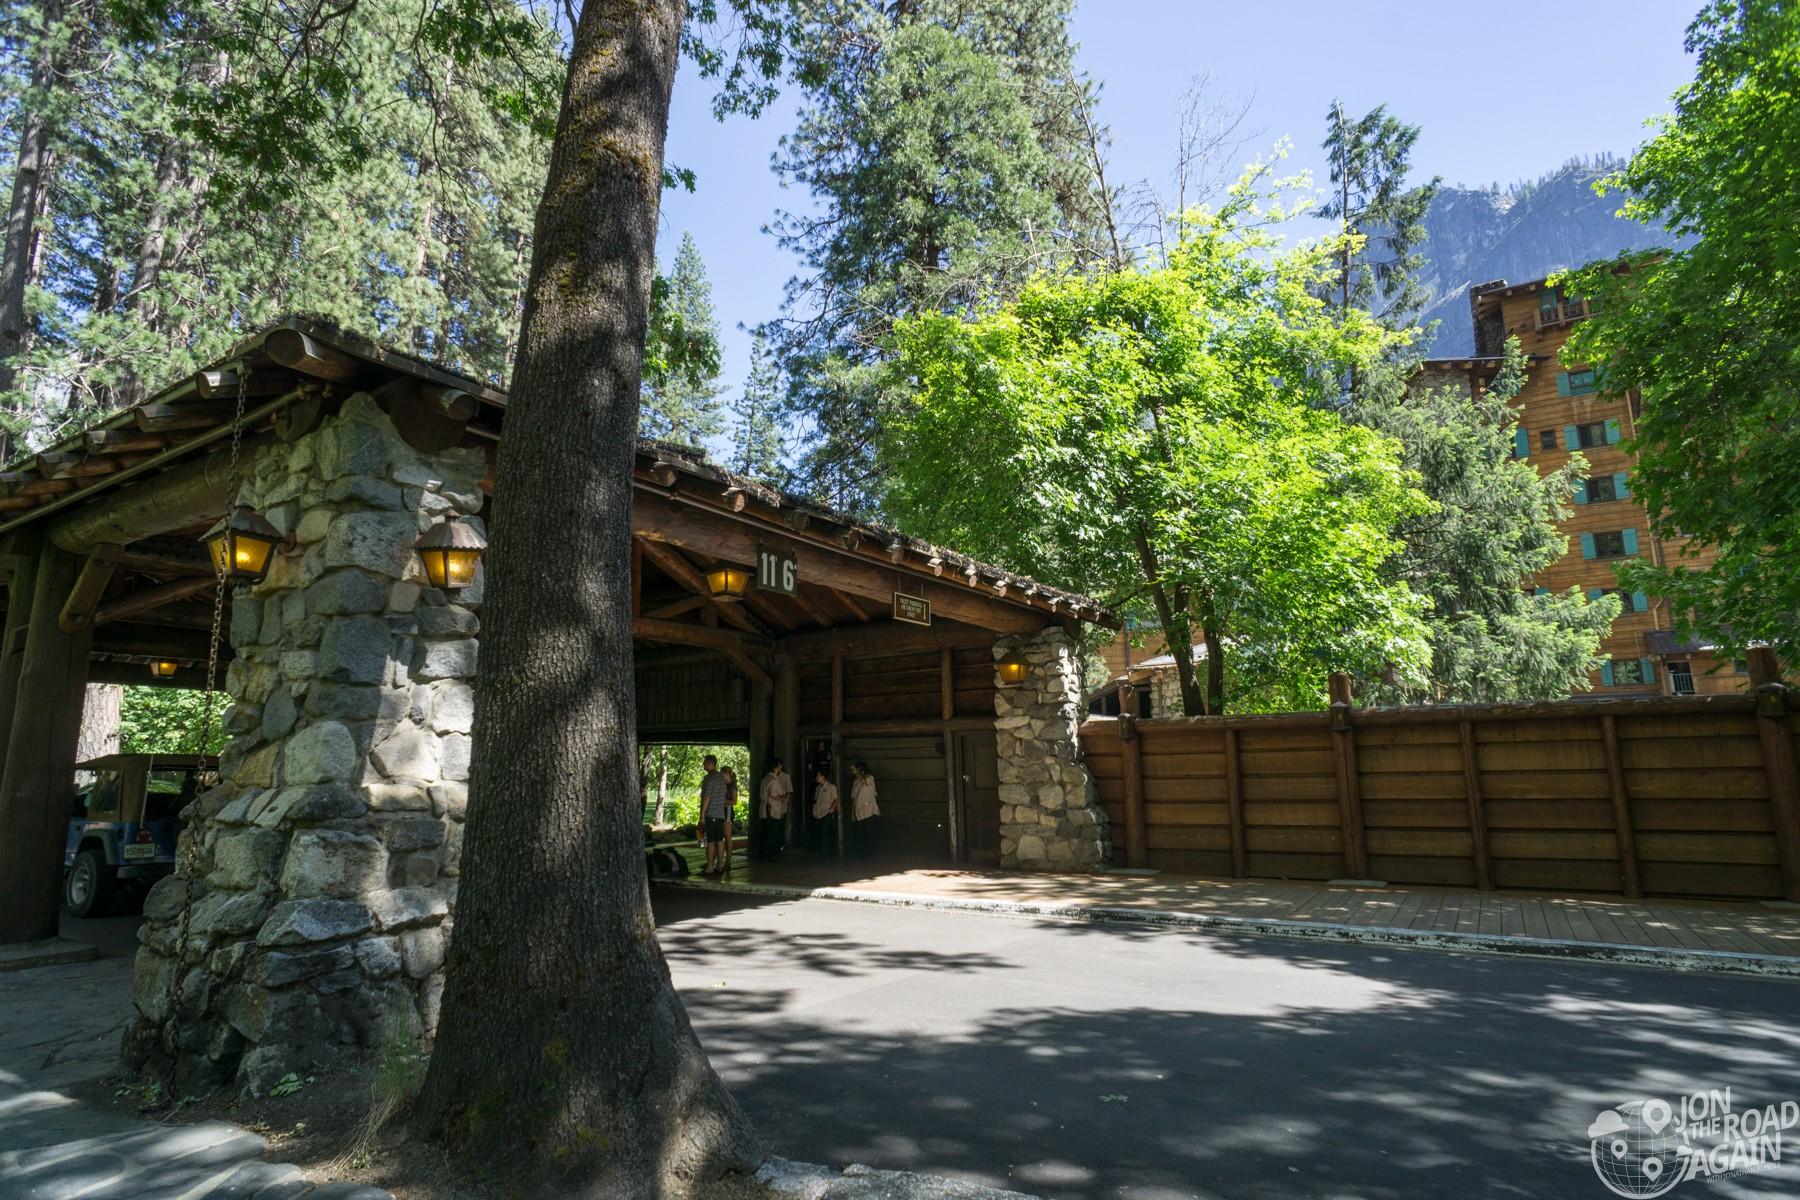 Majestic Yosemite Hotel Entrance